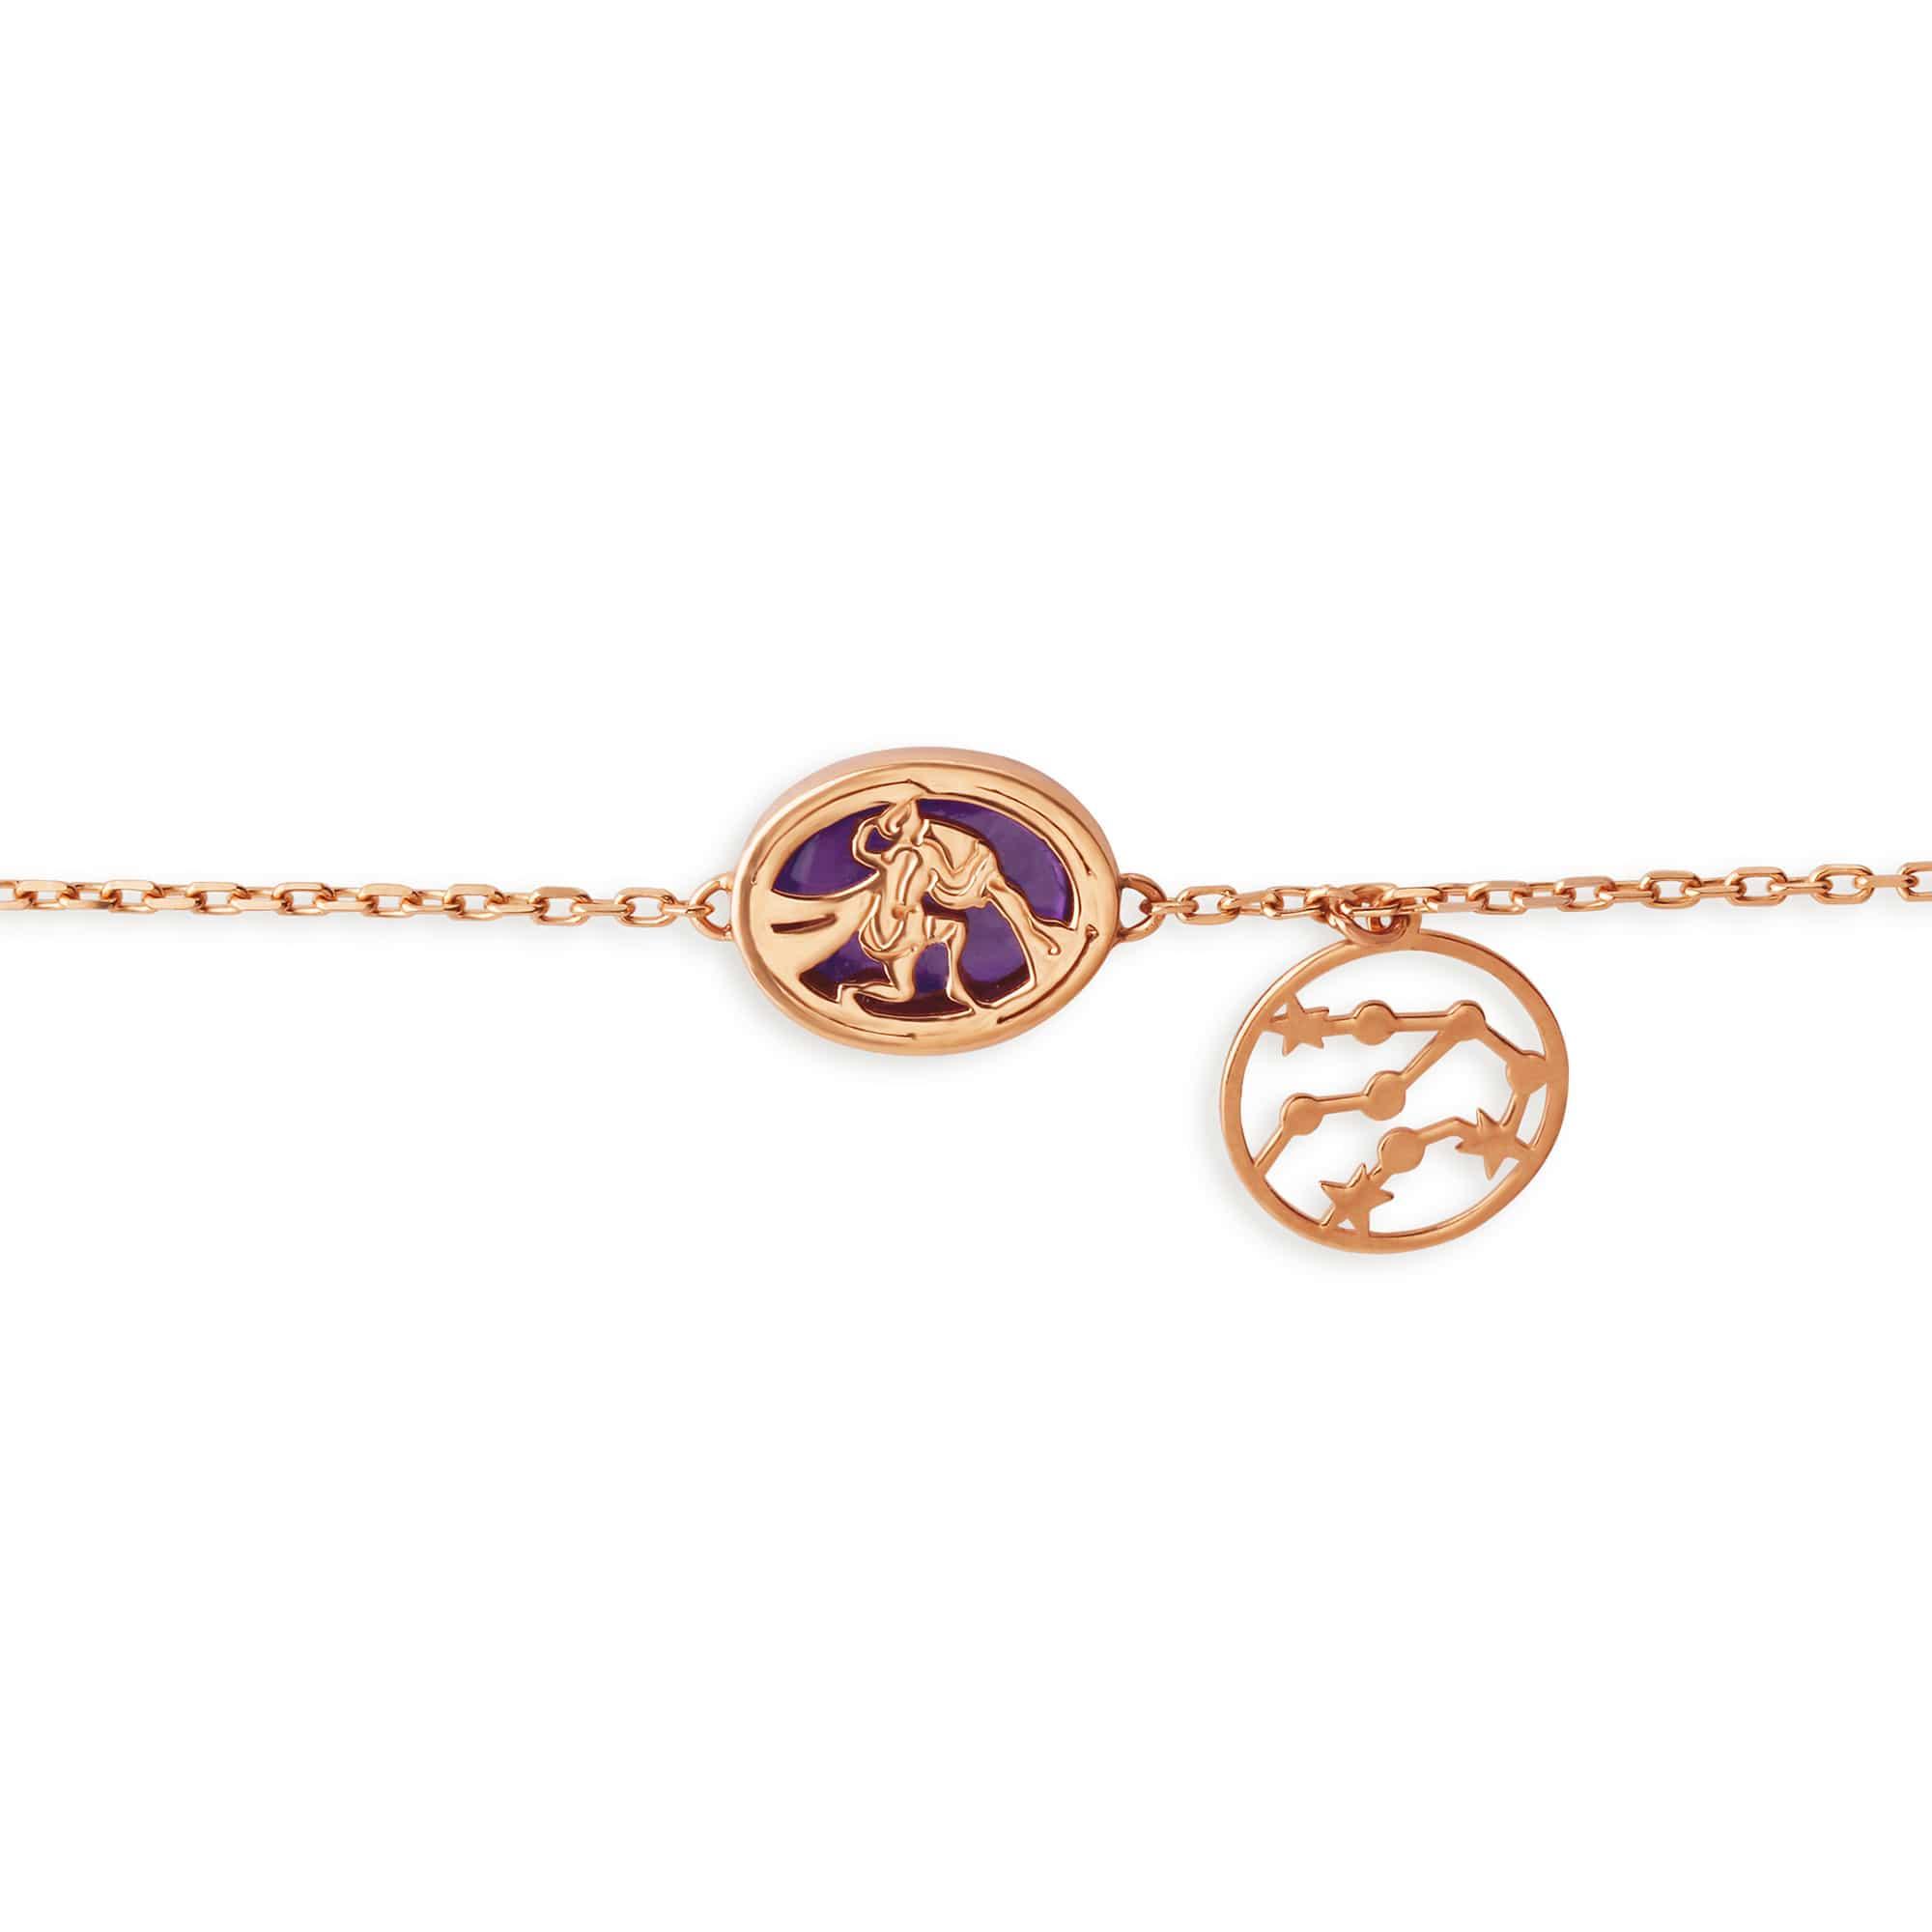 f9c30f2e75b9c Mia by Tanishq 14KT Aquarius Birthstone Rose Gold Bracelet